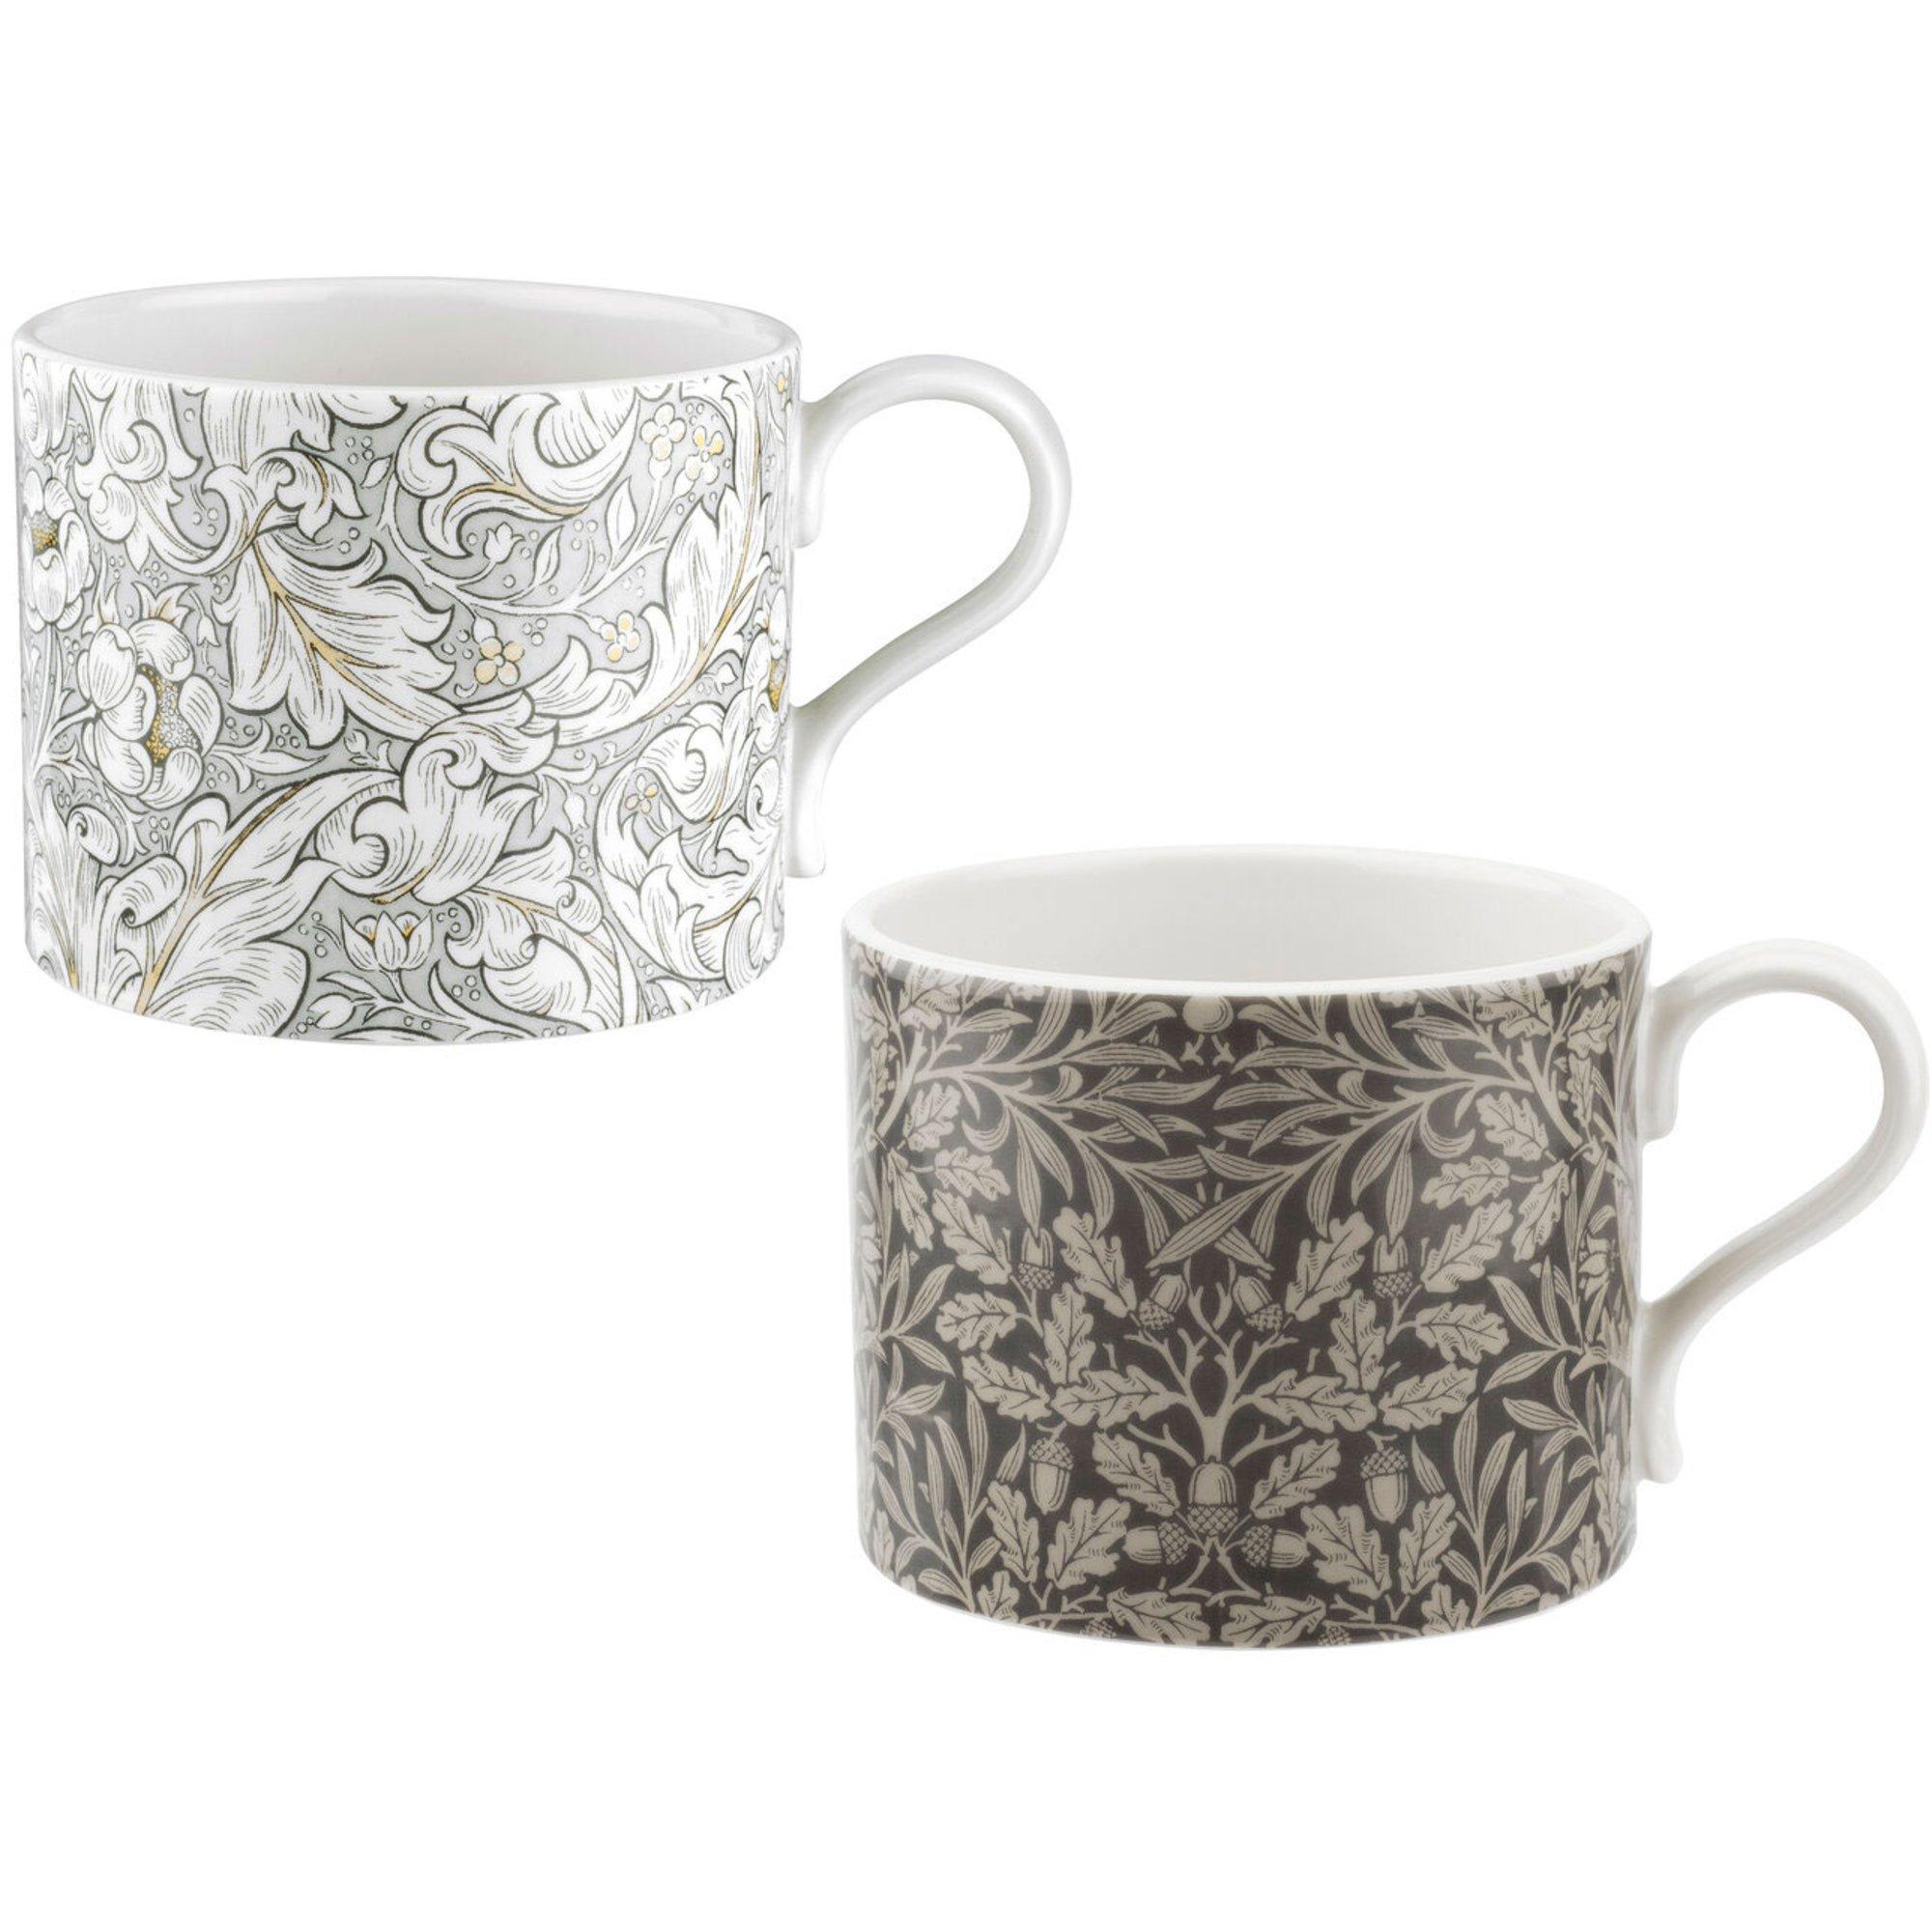 Royal Worcester Pure Bachelors & Acorn Mugg 2 st